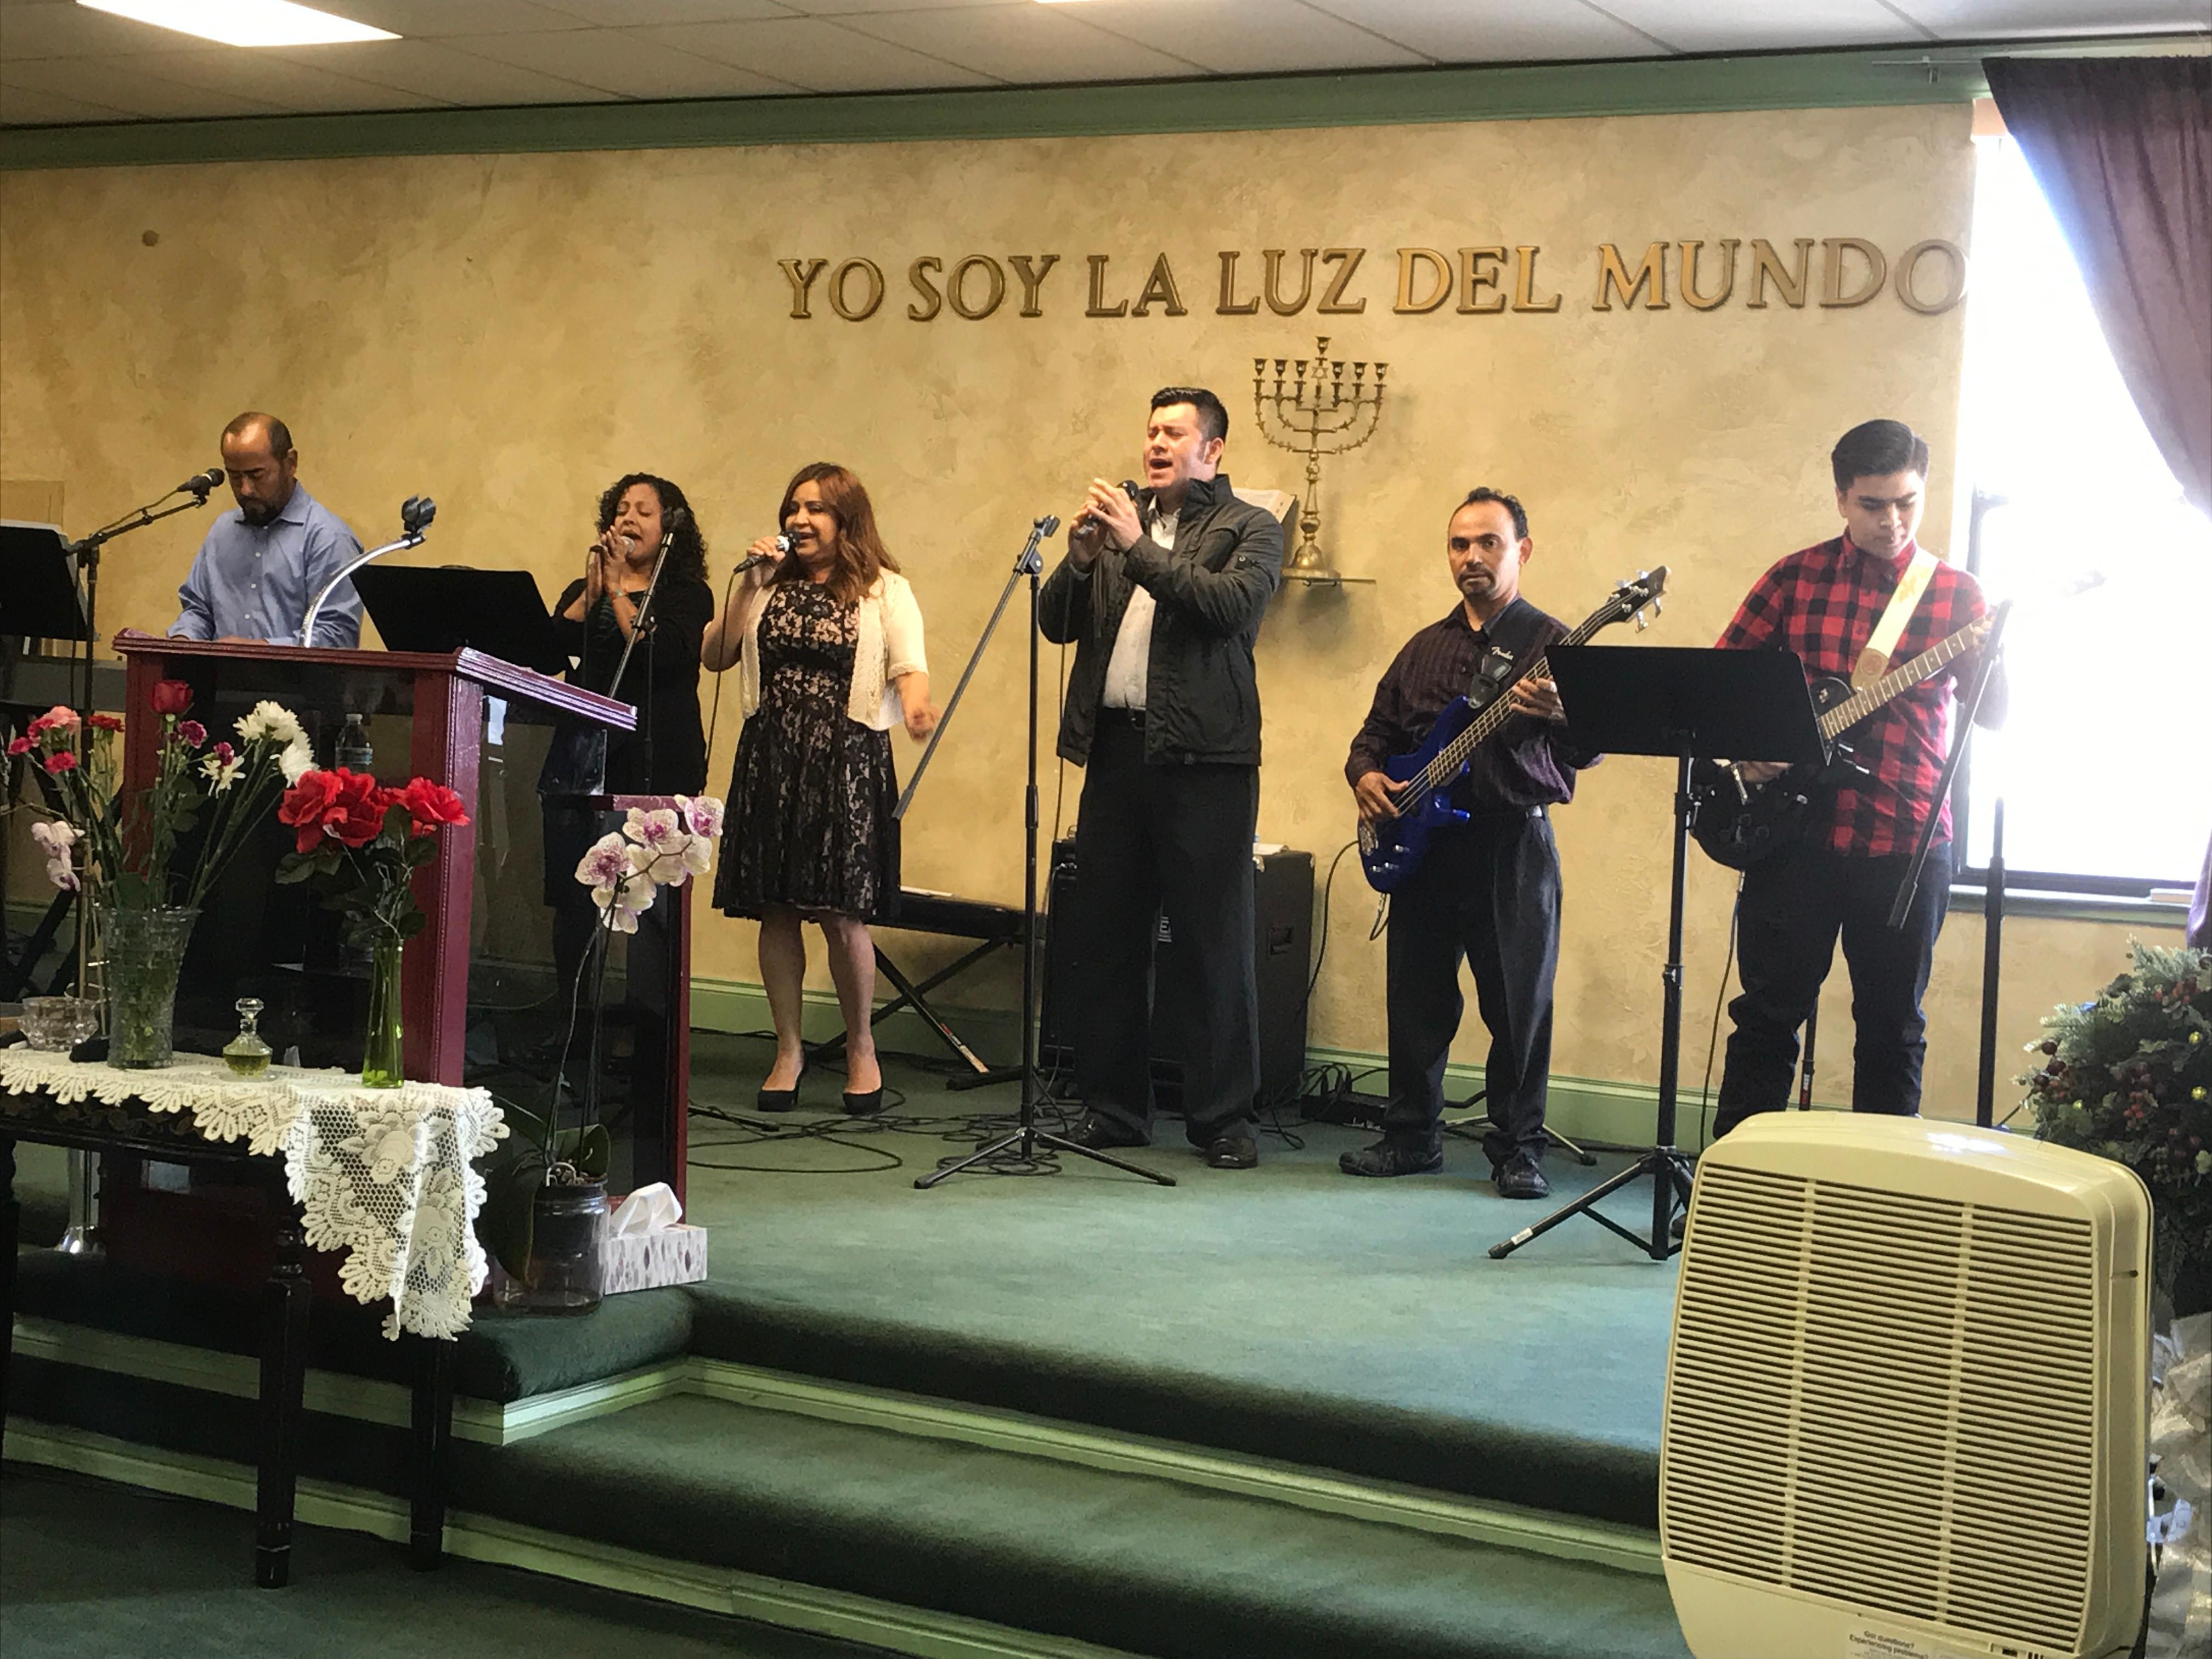 Sunday Services- Culto de Domingo